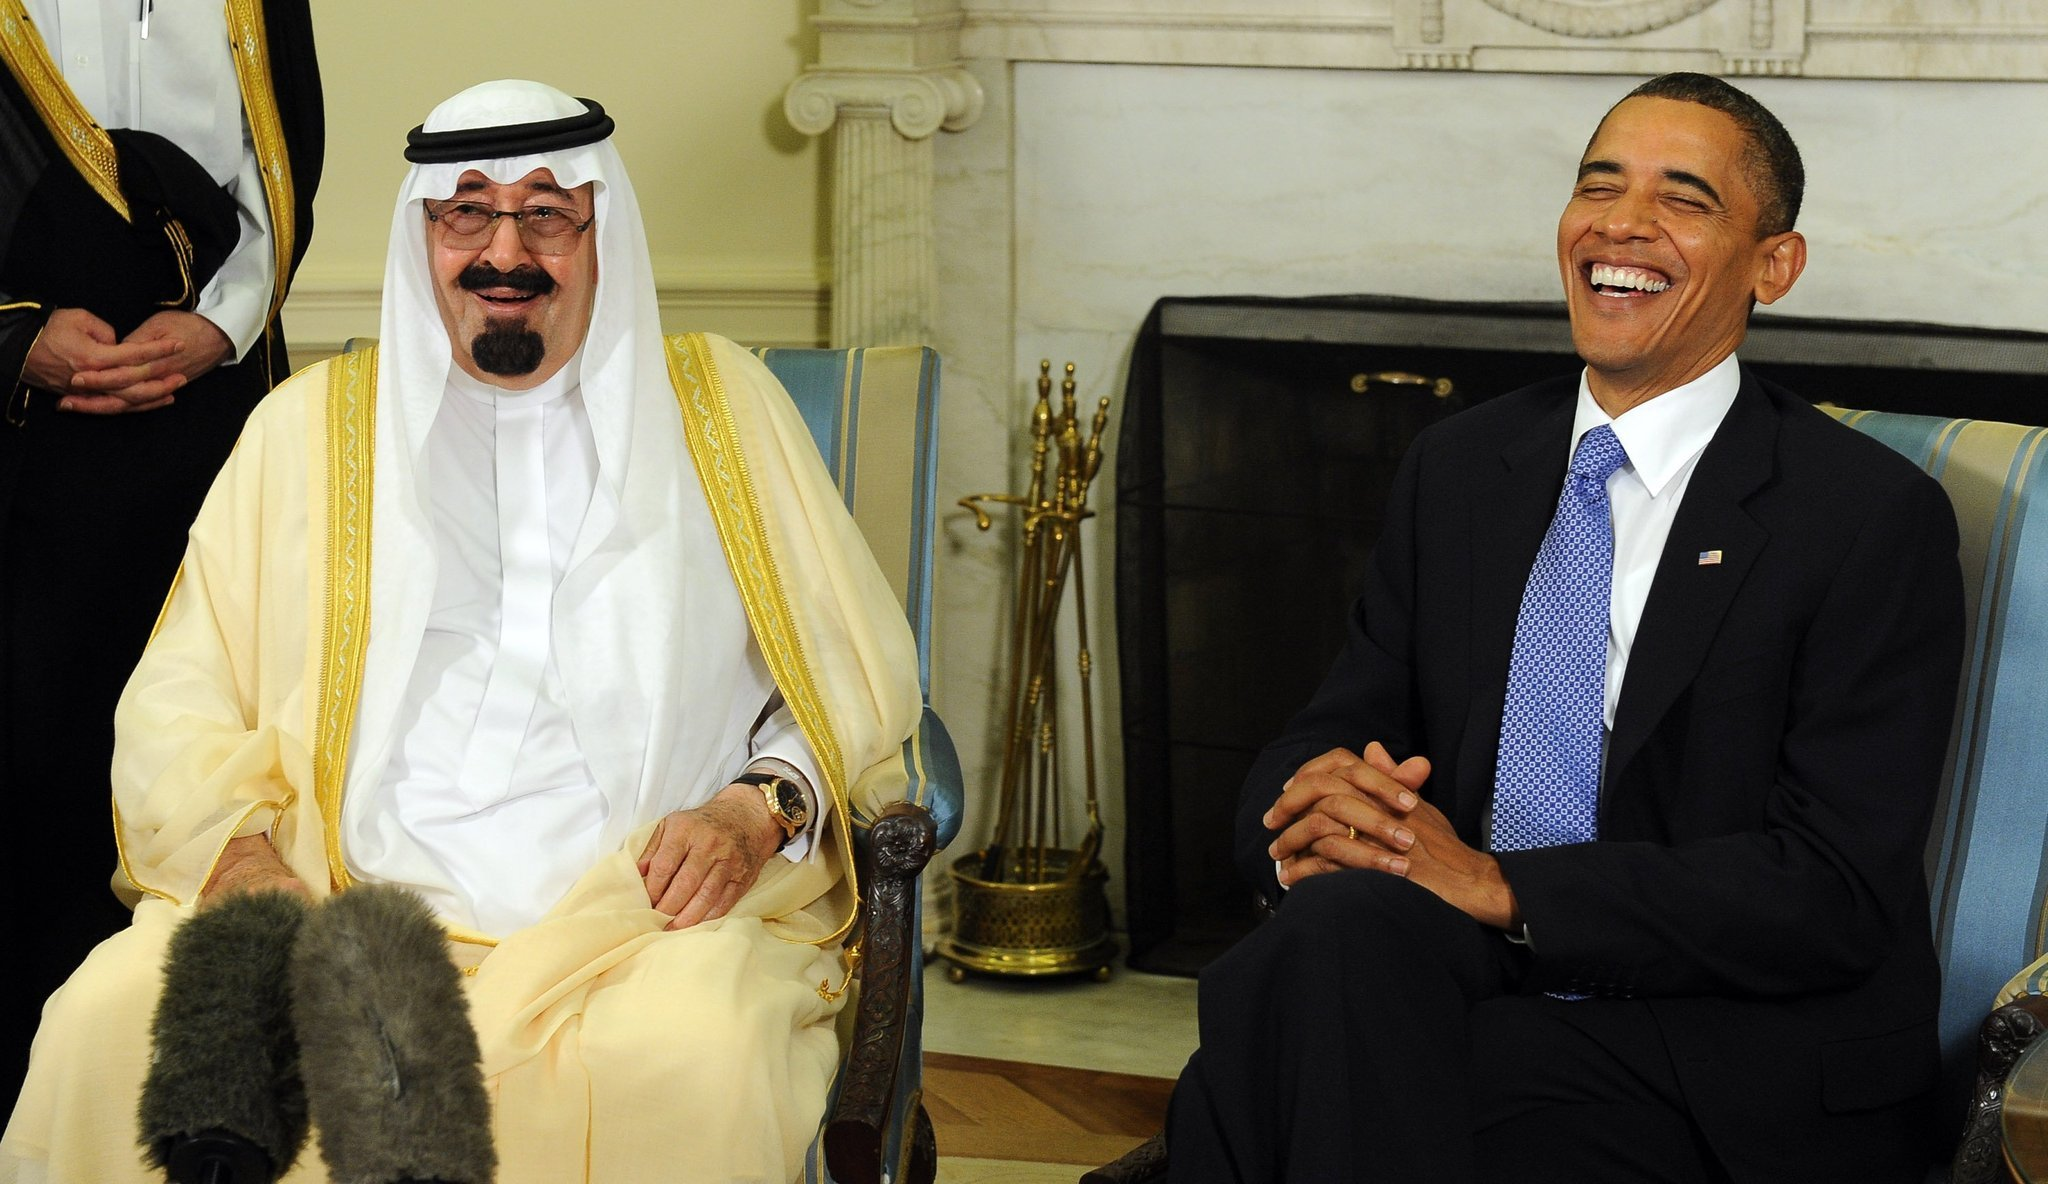 We Miss Saudi Arabia's 'Humane King'